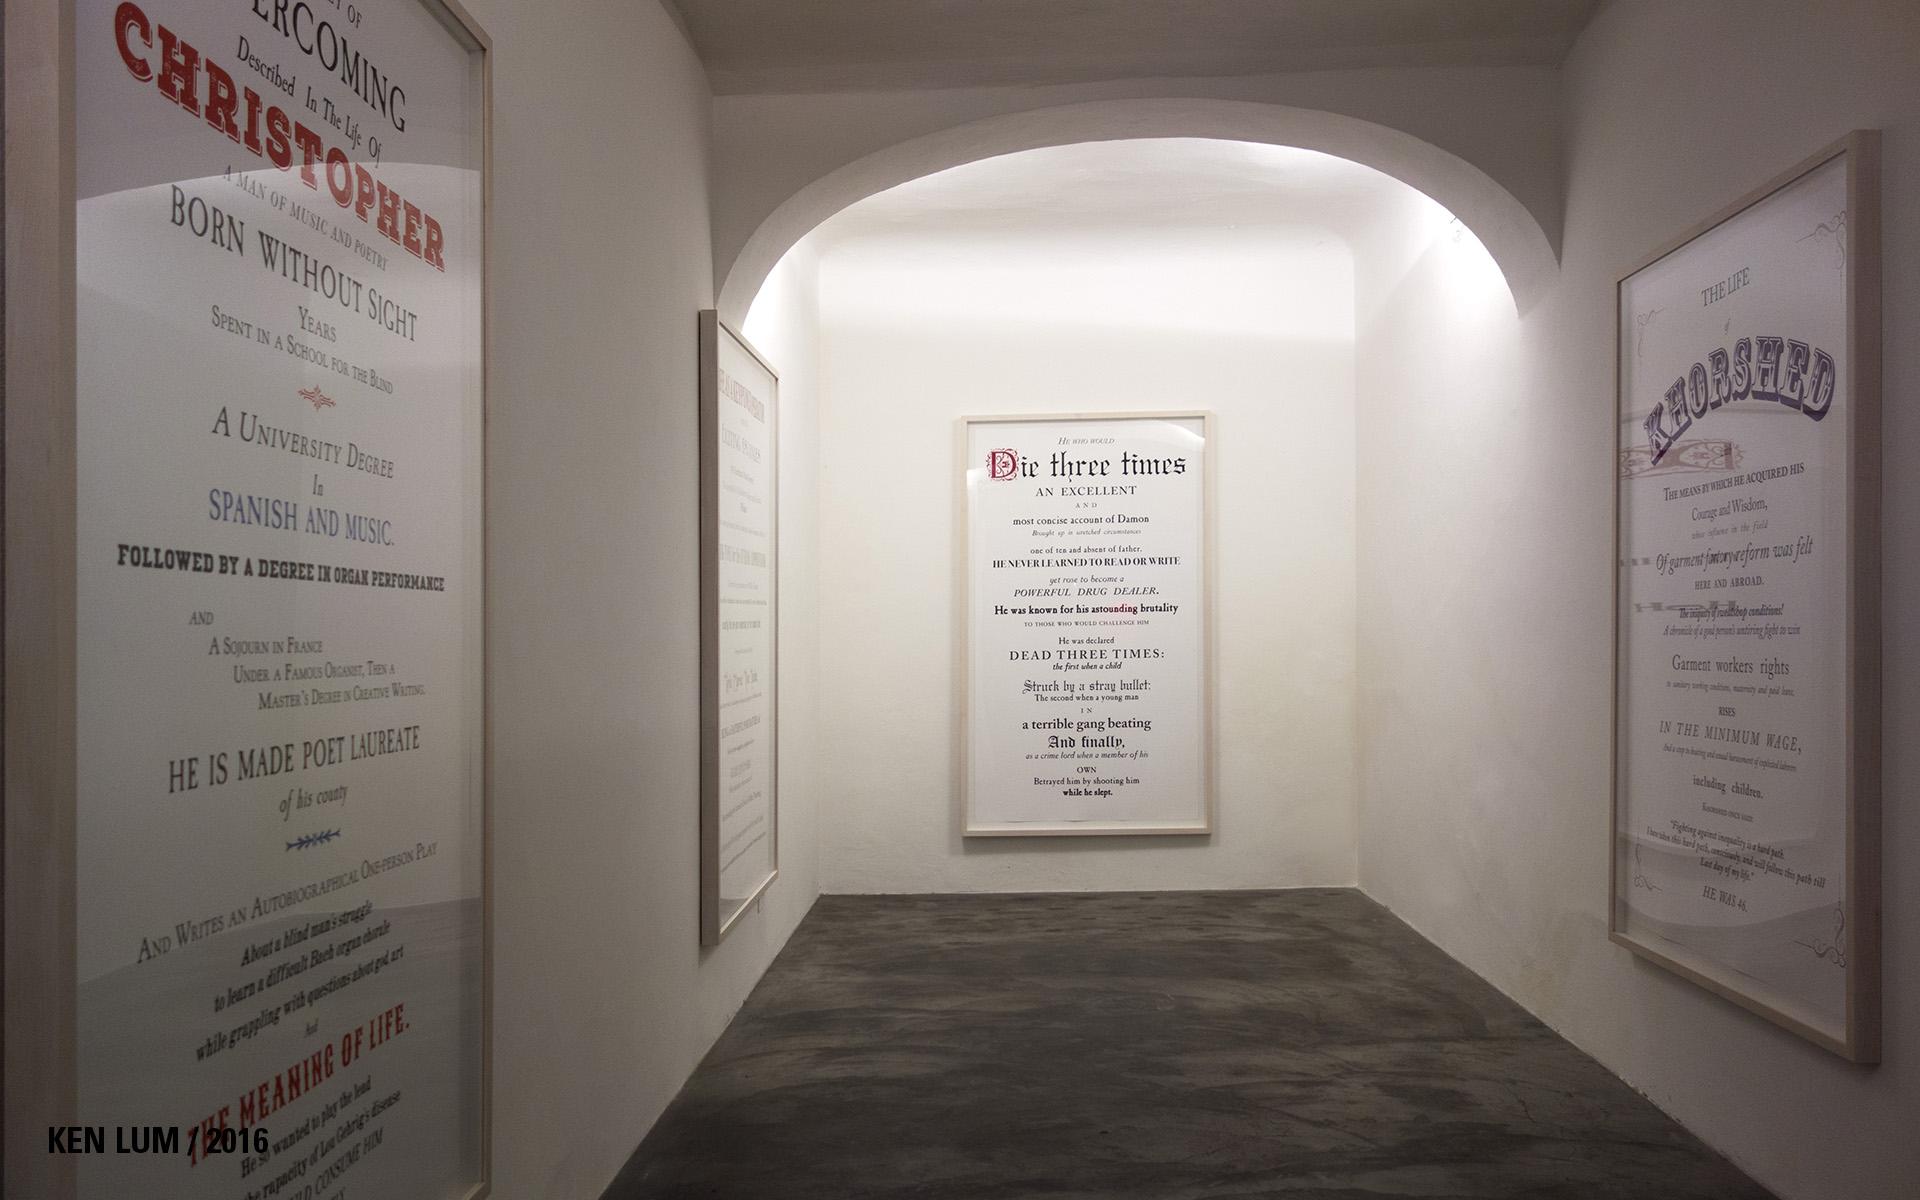 Ken Lum, Installation View, Florence, 2016